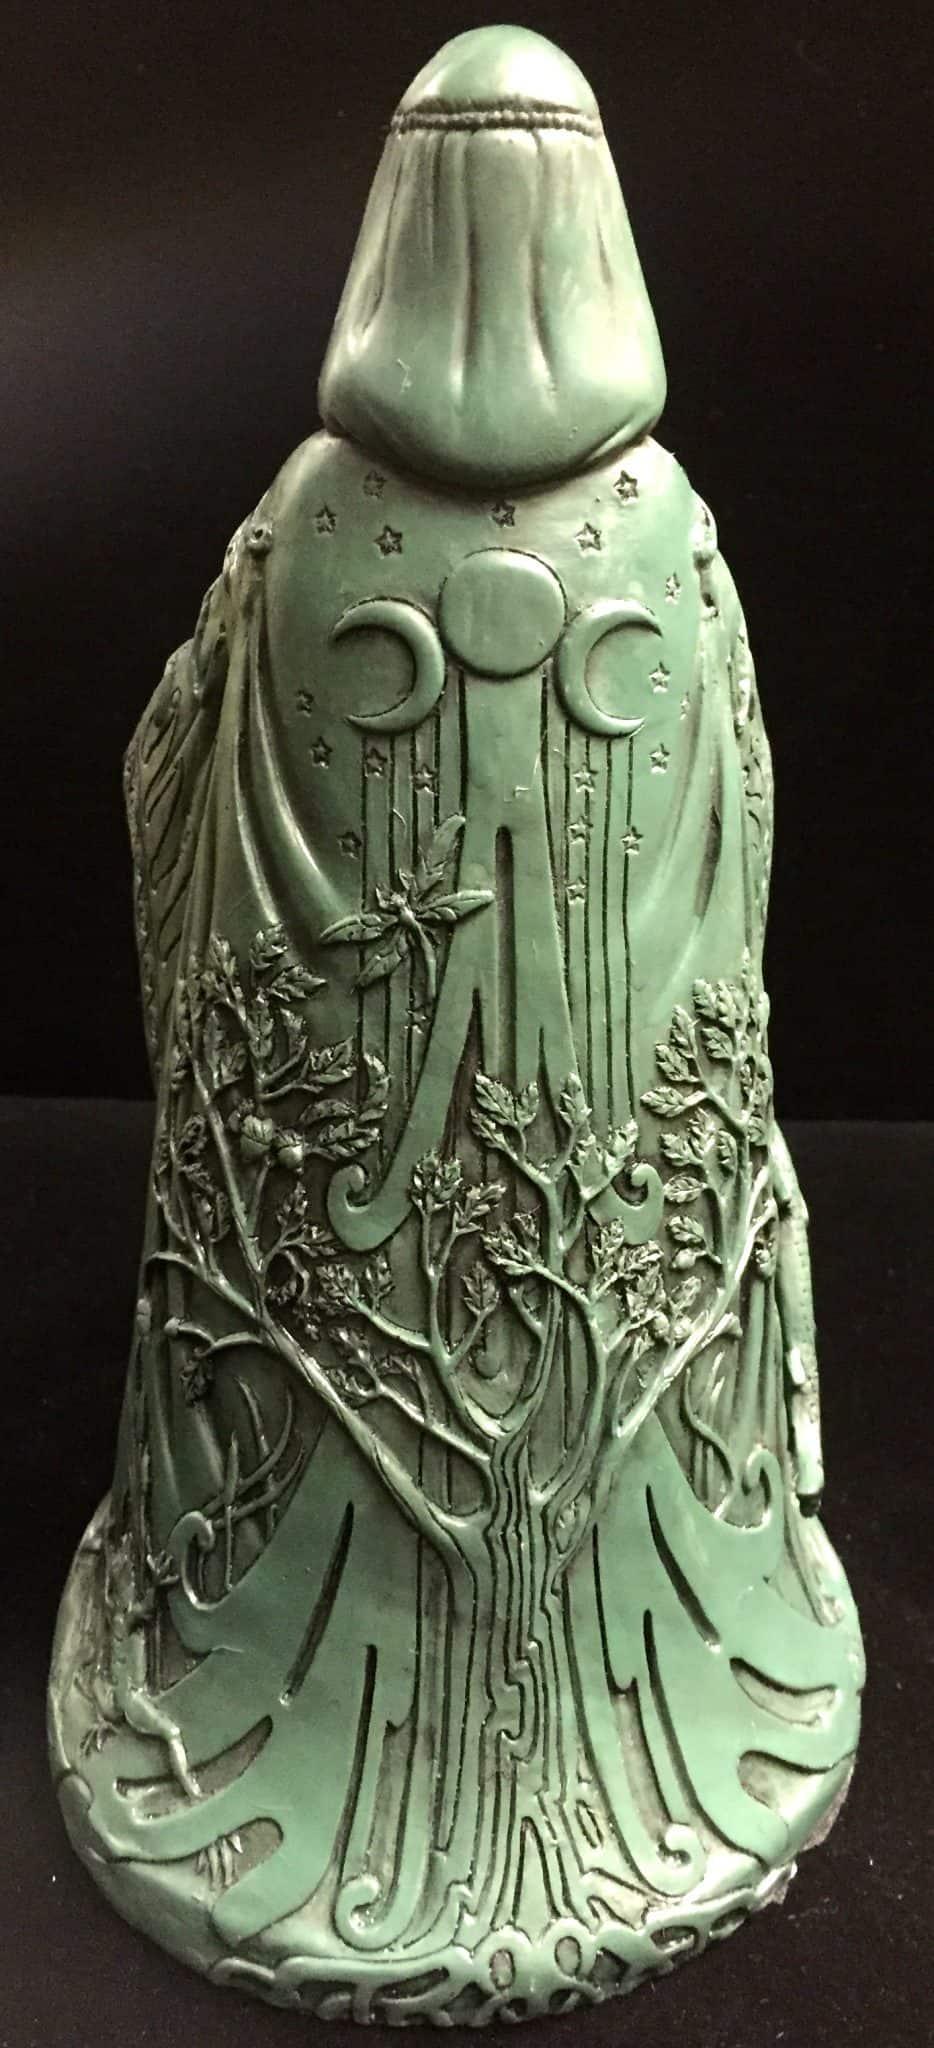 Celtic Goddess Danu Green Bronze Resin Statue by Maxine Miller ©Maxine Miller - Rear View